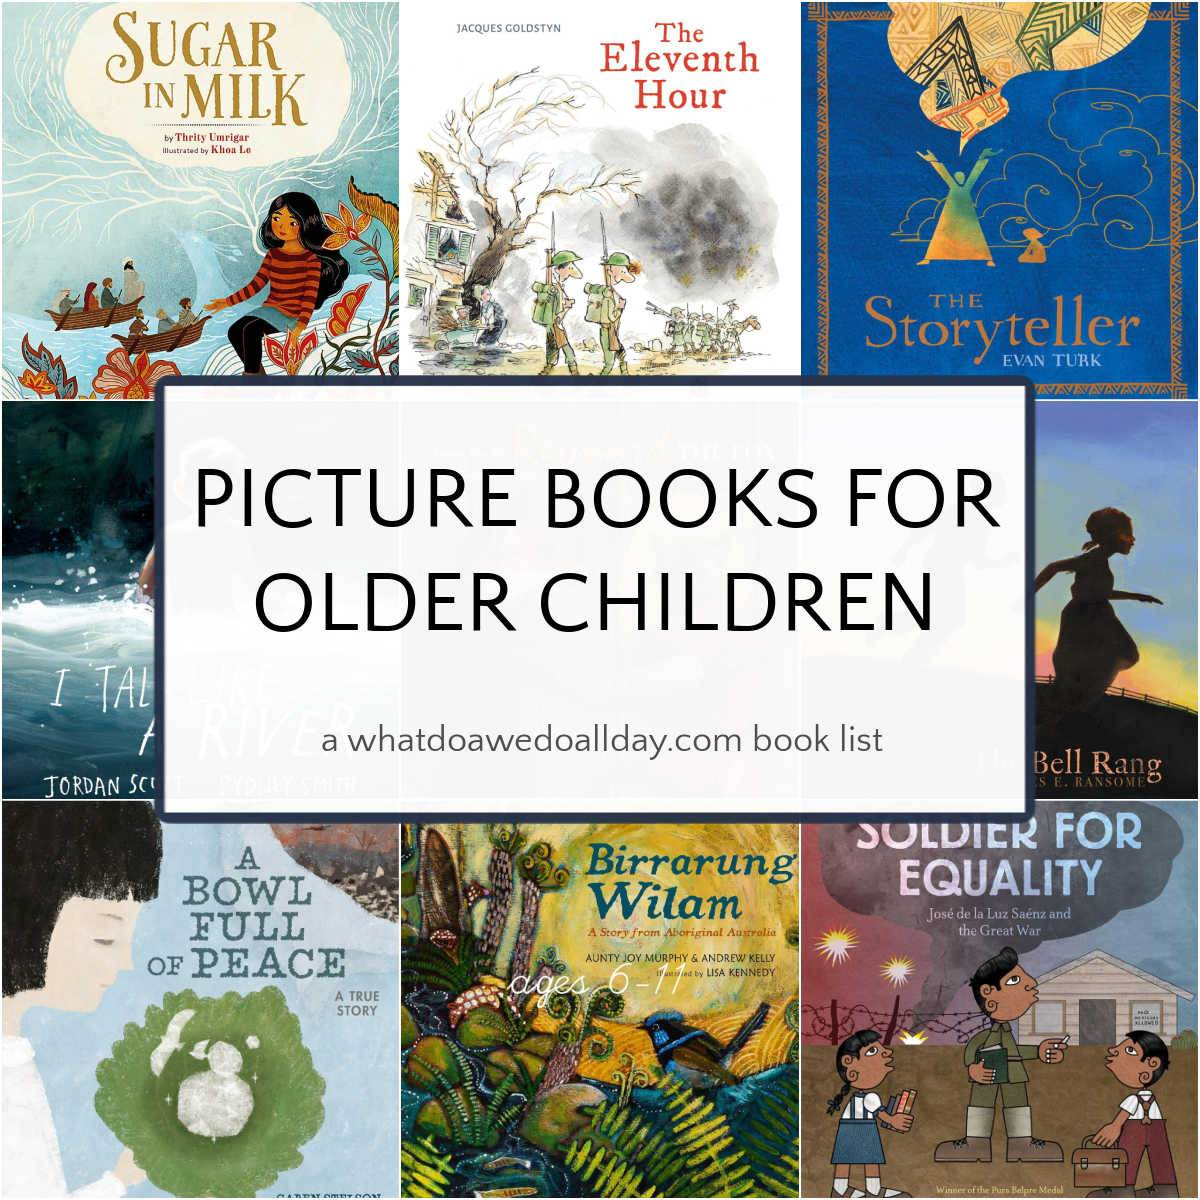 picture books for older children book cover collage